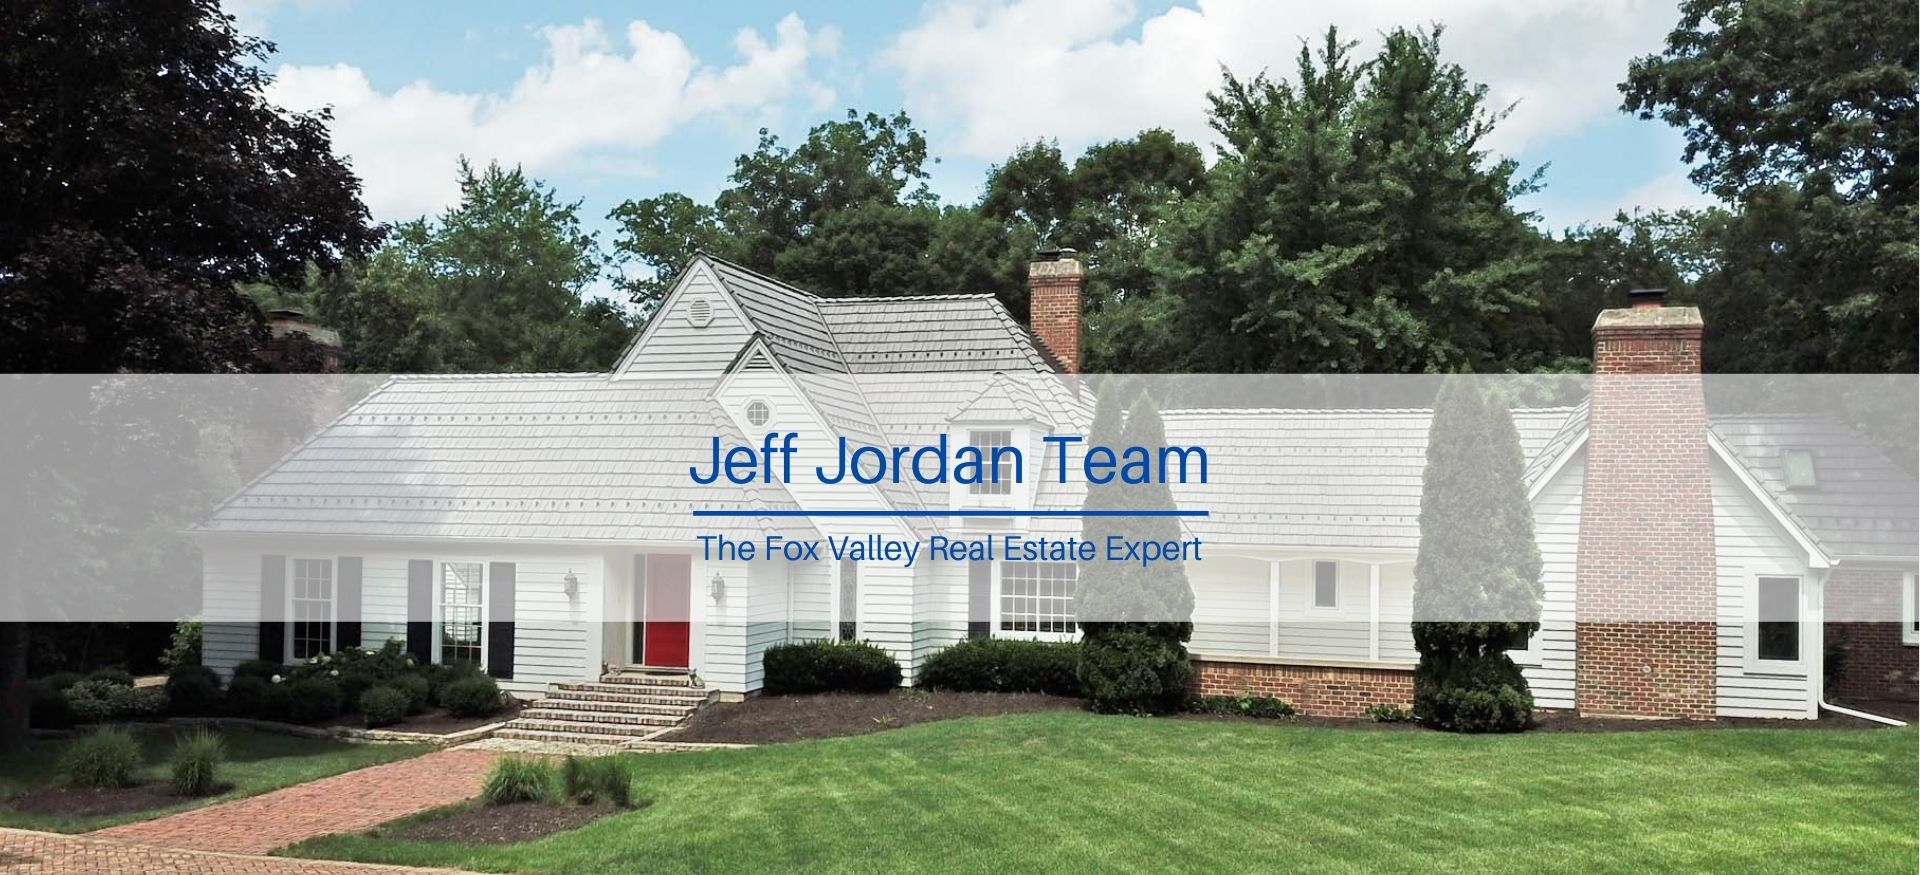 Jeff Jordan Team Army Trail Rd Wayne IL